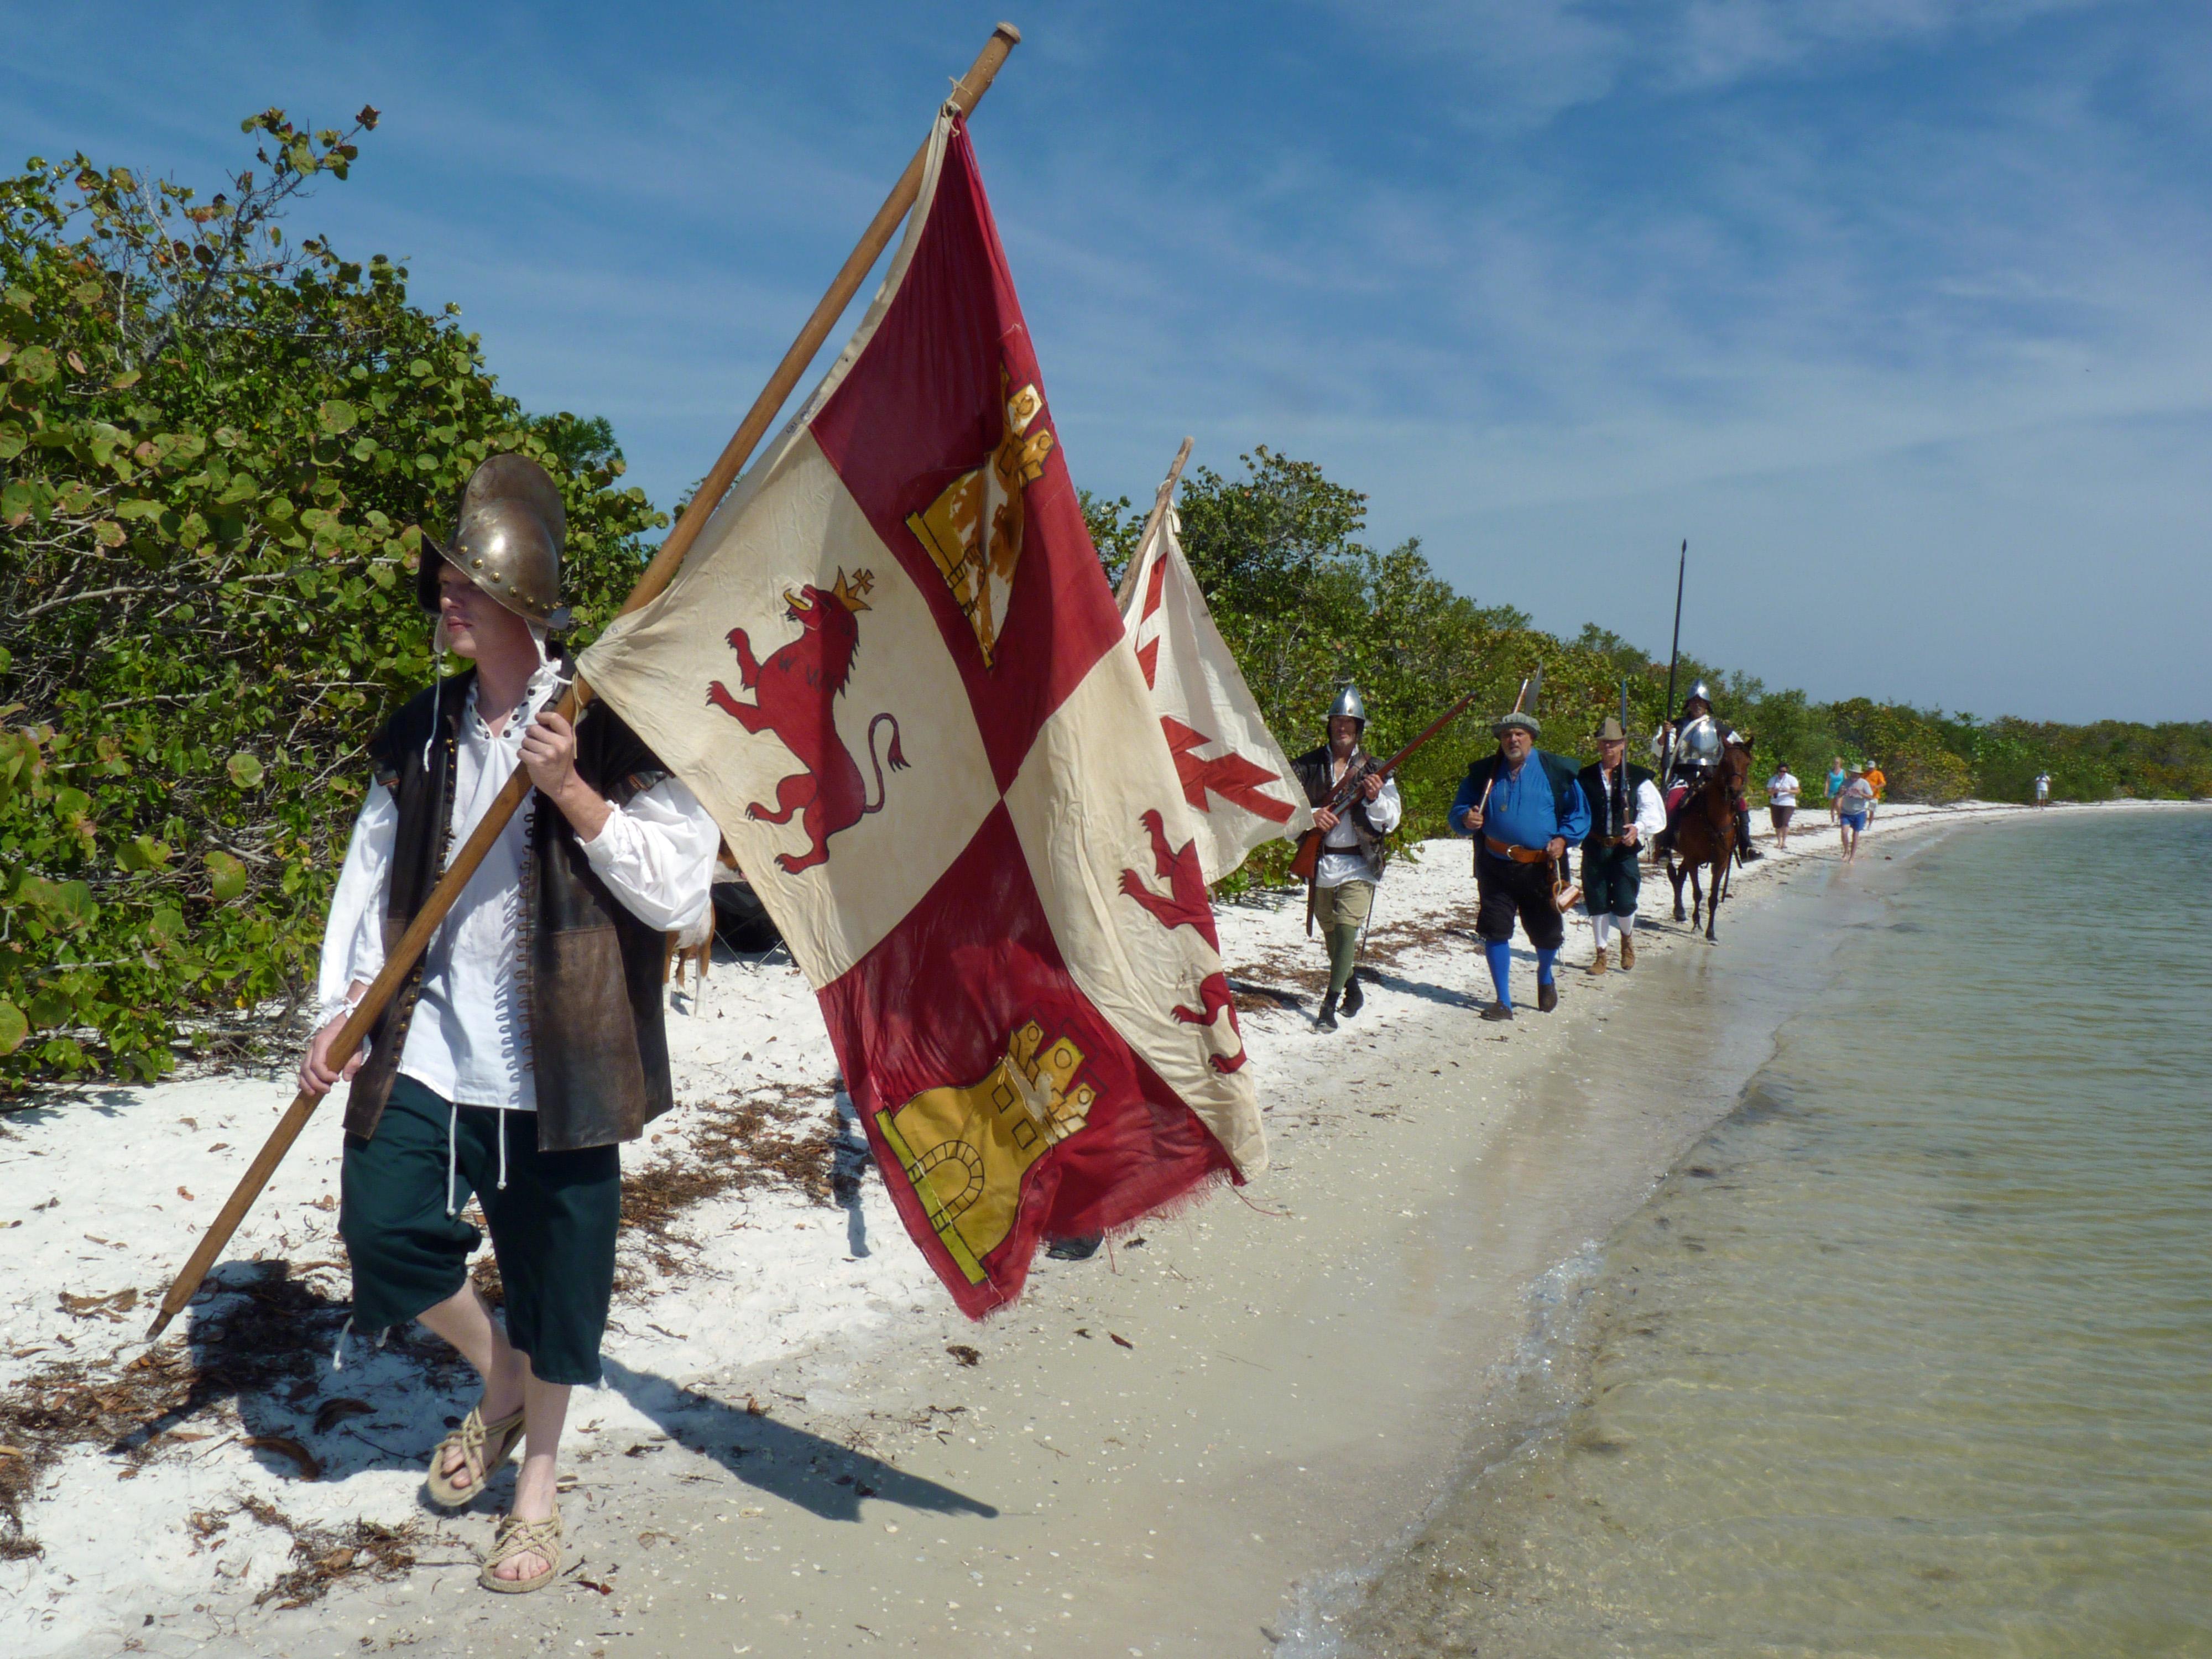 laws policies de soto national memorial u s national park service